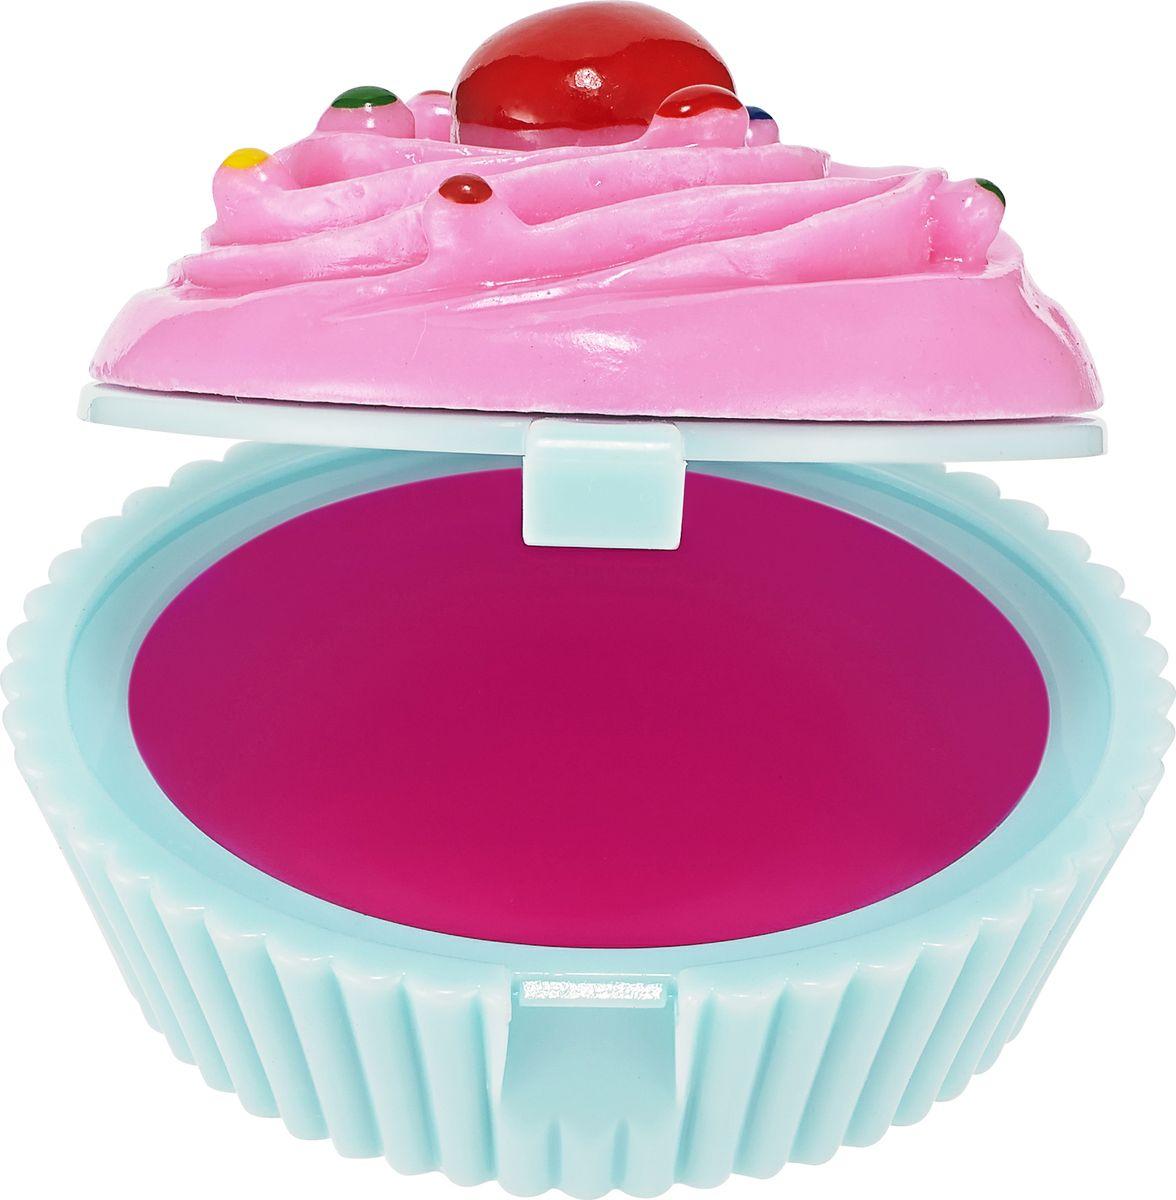 Holika Holika Бальзам для губ Время дессерта, тон 04, розовая слива, 7 г200141846668 Holika Holika Dessert Time Lip Balm AD04 (Plumpink Cup Cake) Бальзам для губ Время дессерта (Пирожное розовая слива).